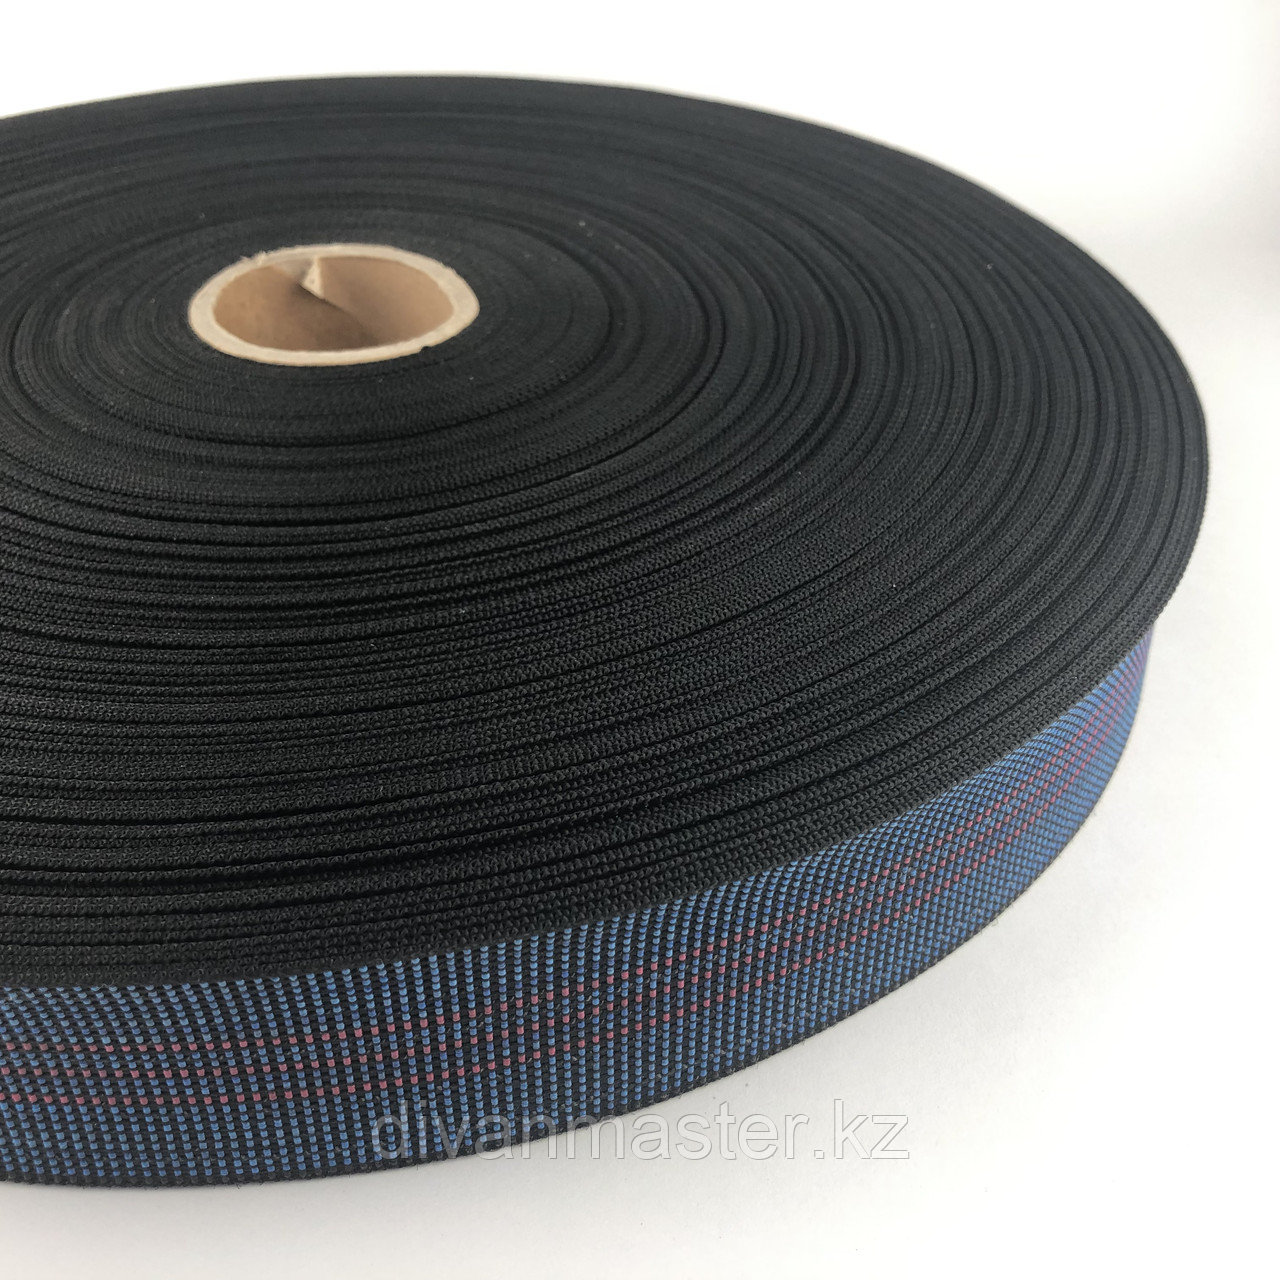 Резина мебельная 50 м/рул